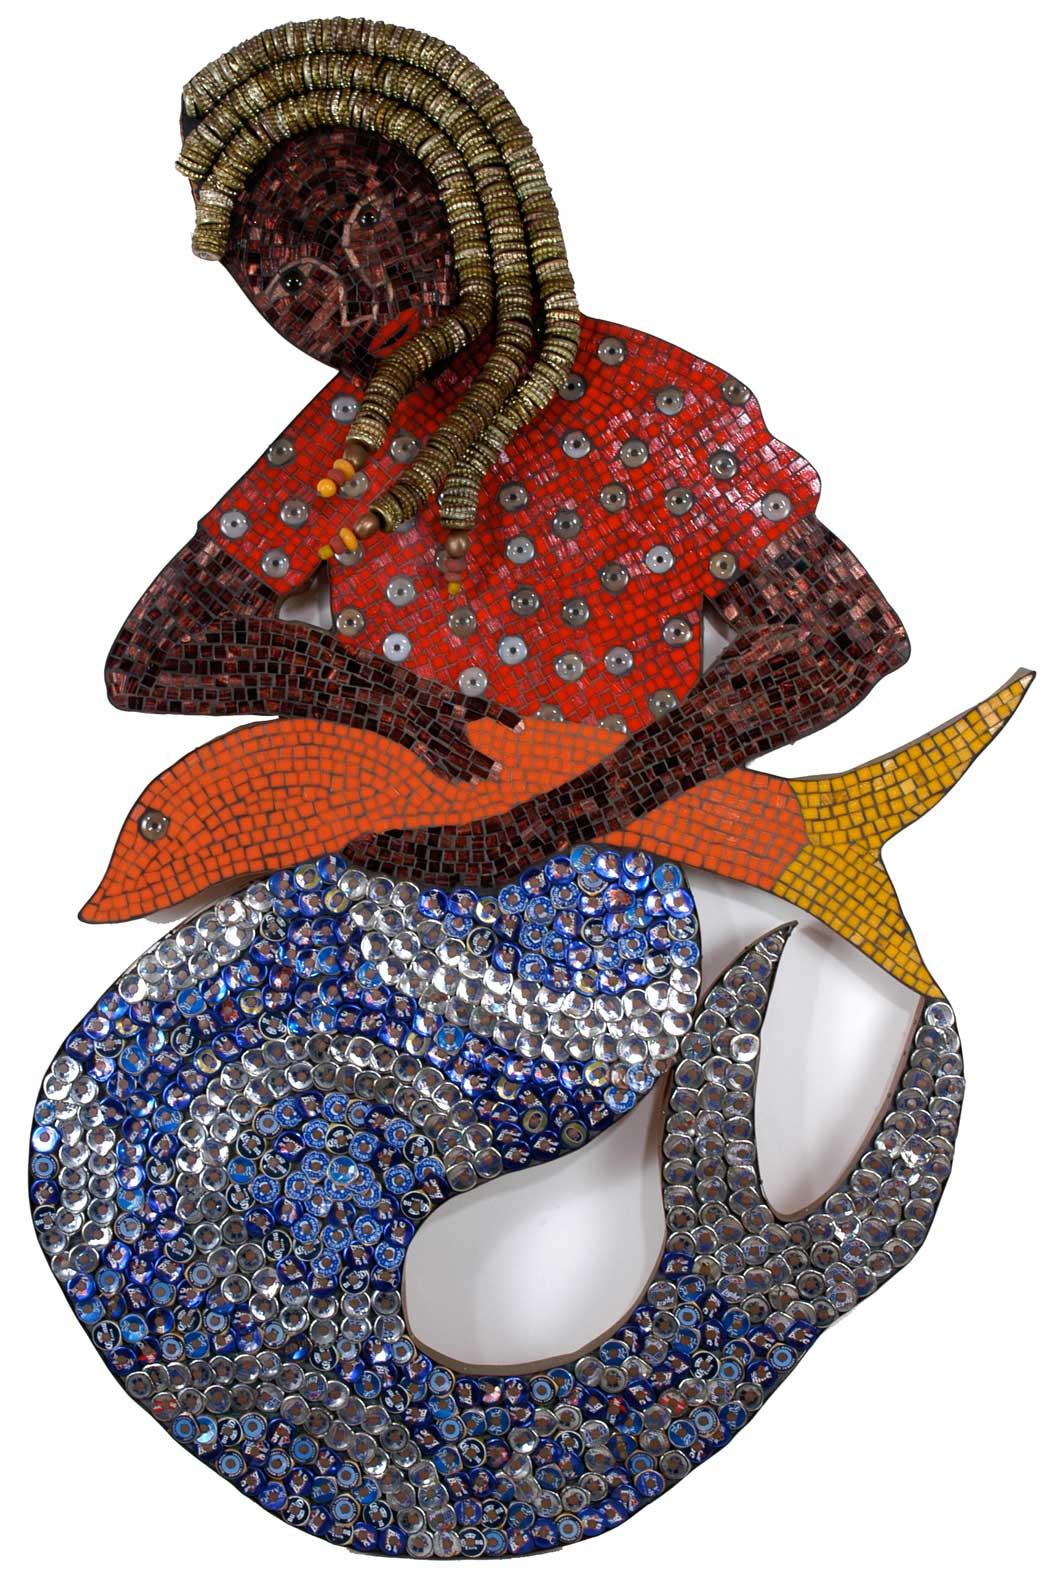 La Siren II: A Mosaic Mermaid Sculpture in Bottle Caps and Glass, 2004